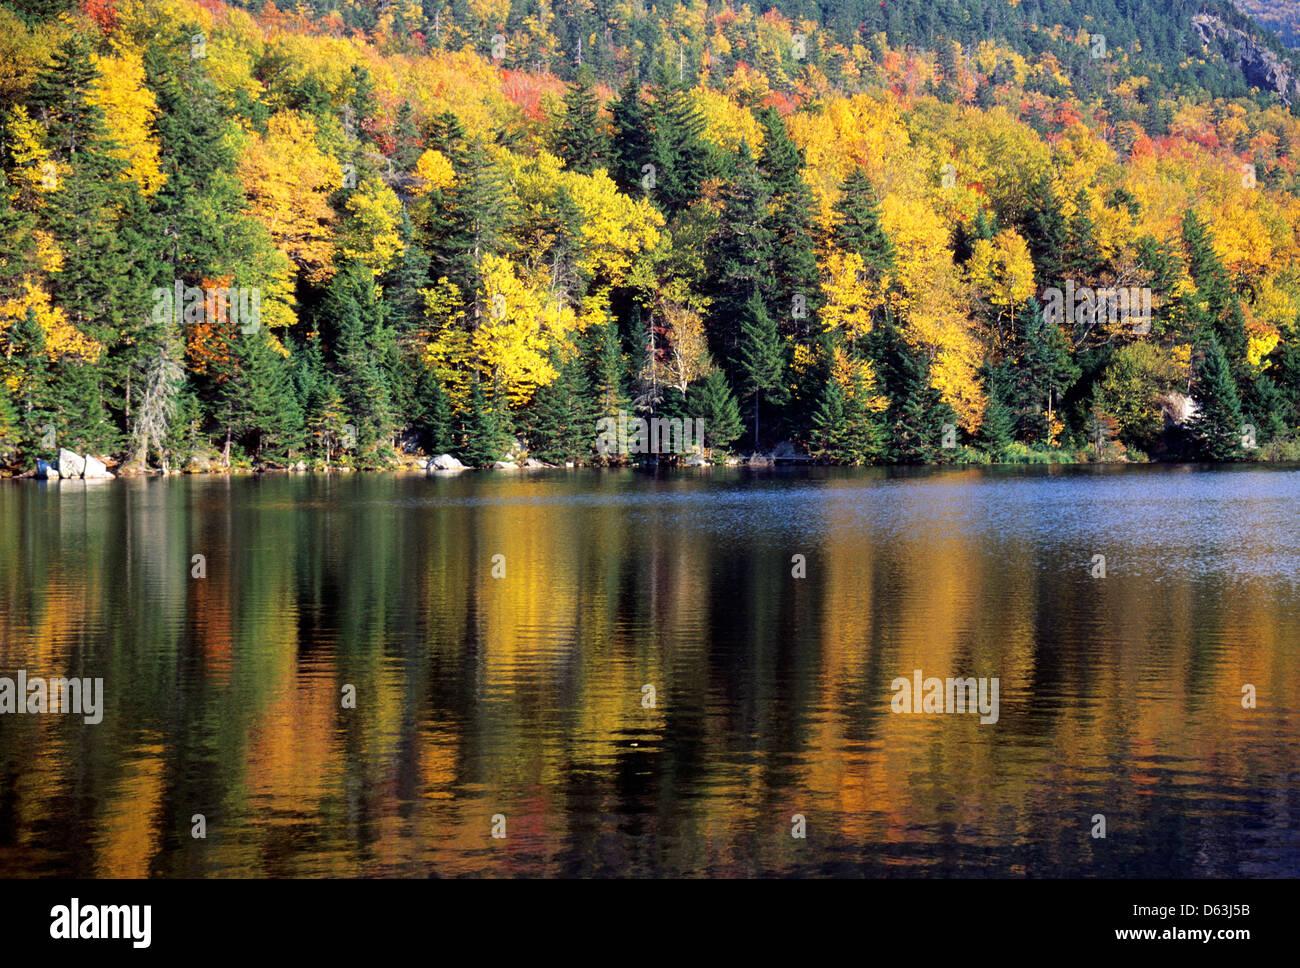 Elk281-1546 New Hampshire, White Mountains, Crawford Notch, Crawford Notch Lake - Stock Image